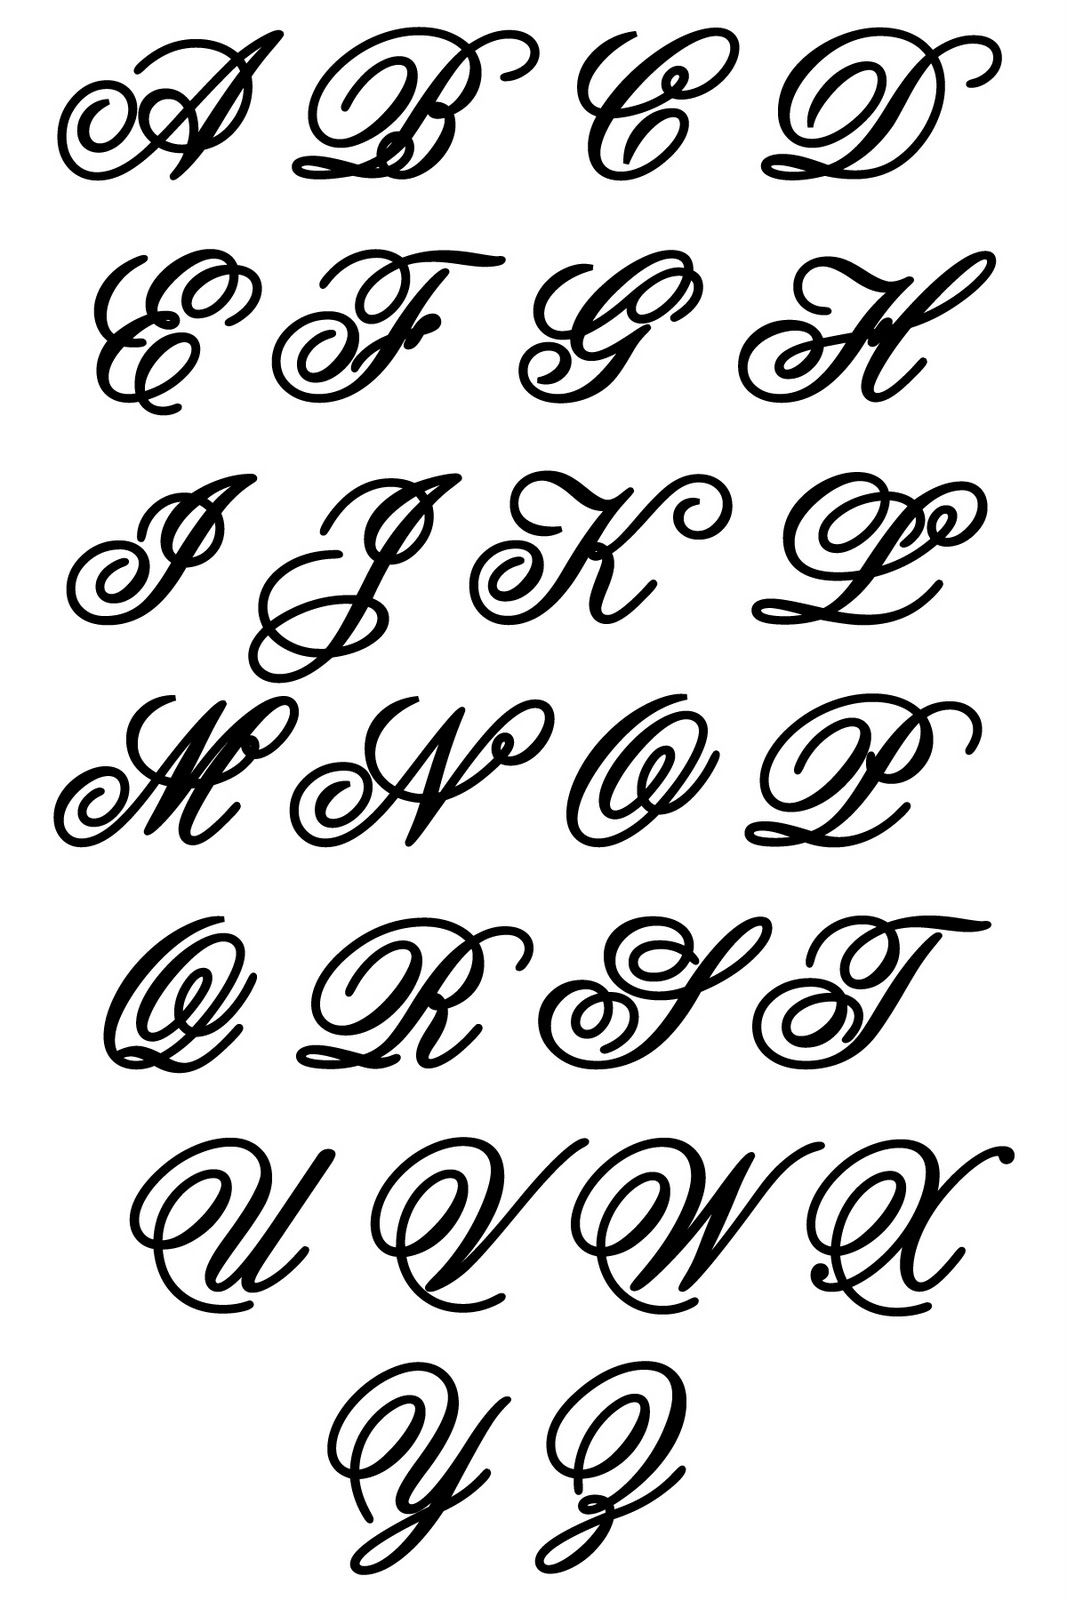 Calligraphy Cursive Capital Letters : calligraphy, cursive, capital, letters, Script, LgMonograms.jpg, (1067×1600), Fancy, Letters,, Lettering, Styles, Alphabet,, Alphabet